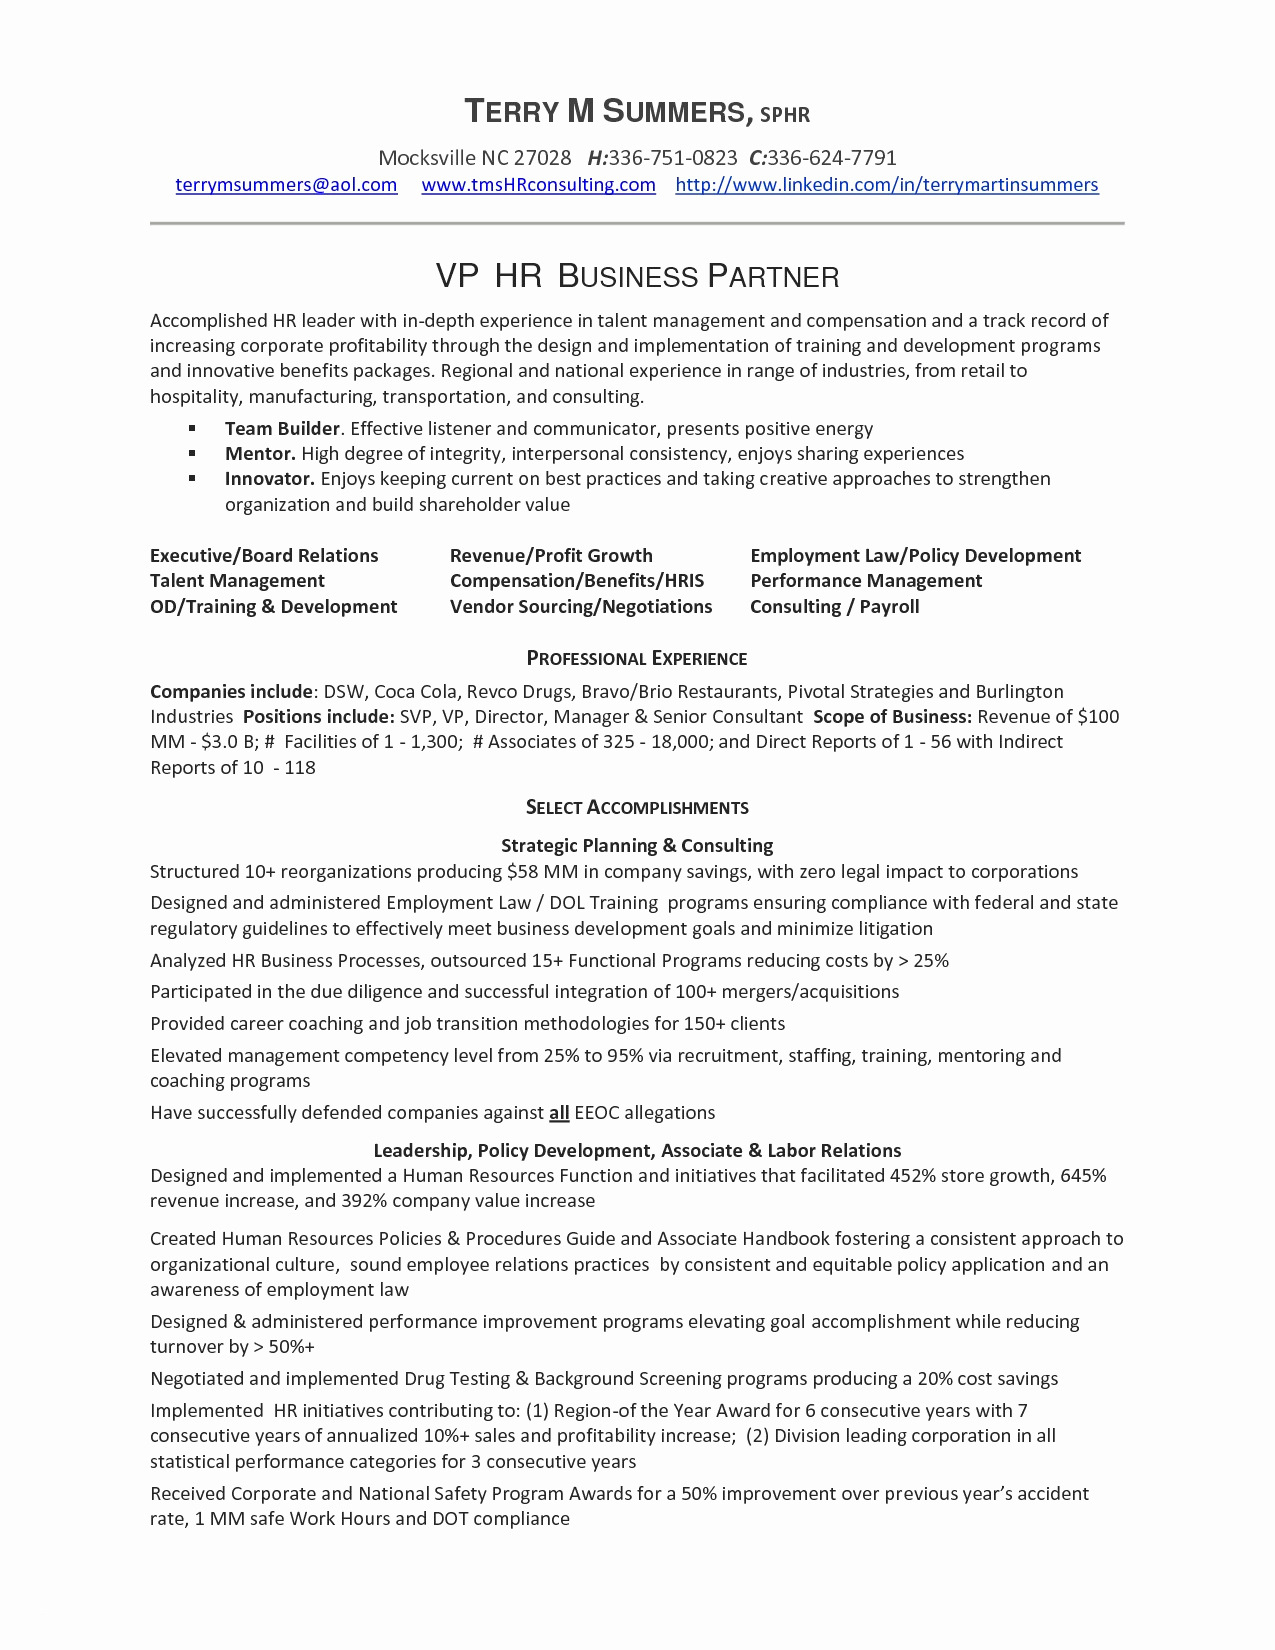 Business Presentation Letter Template - Resume Templates Doc Fresh Business Analyst Resume Sample Doc